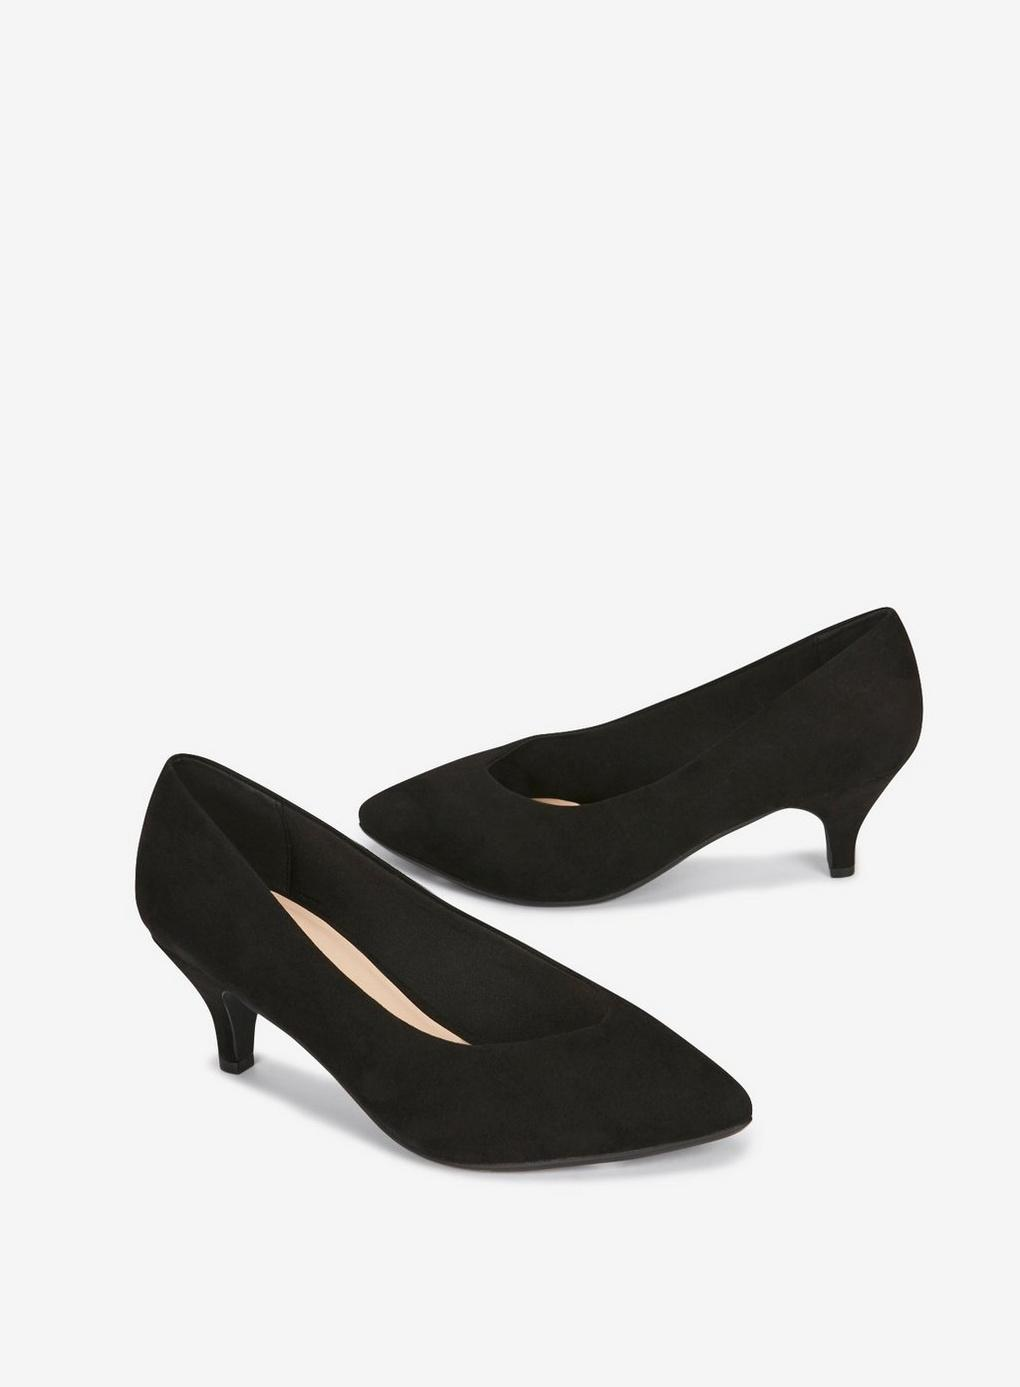 90d5a6d42b0 Evans - Wide Fit Black Kitten Court Shoes - Lyst. View fullscreen